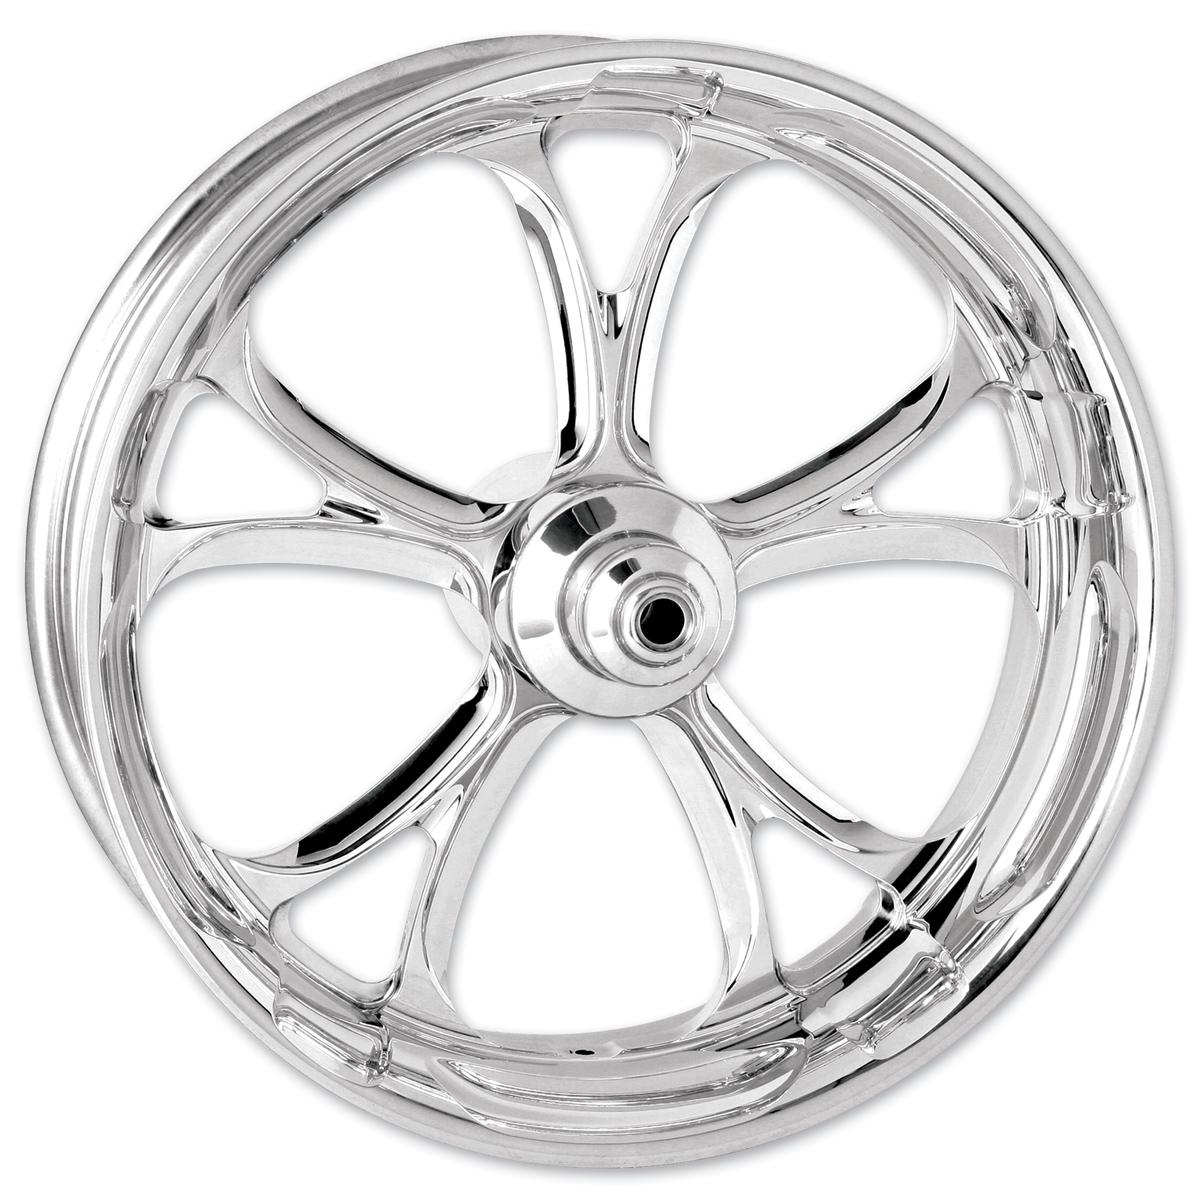 Performance Machine Luxe Chrome Rear Wheel 17x6 ABS